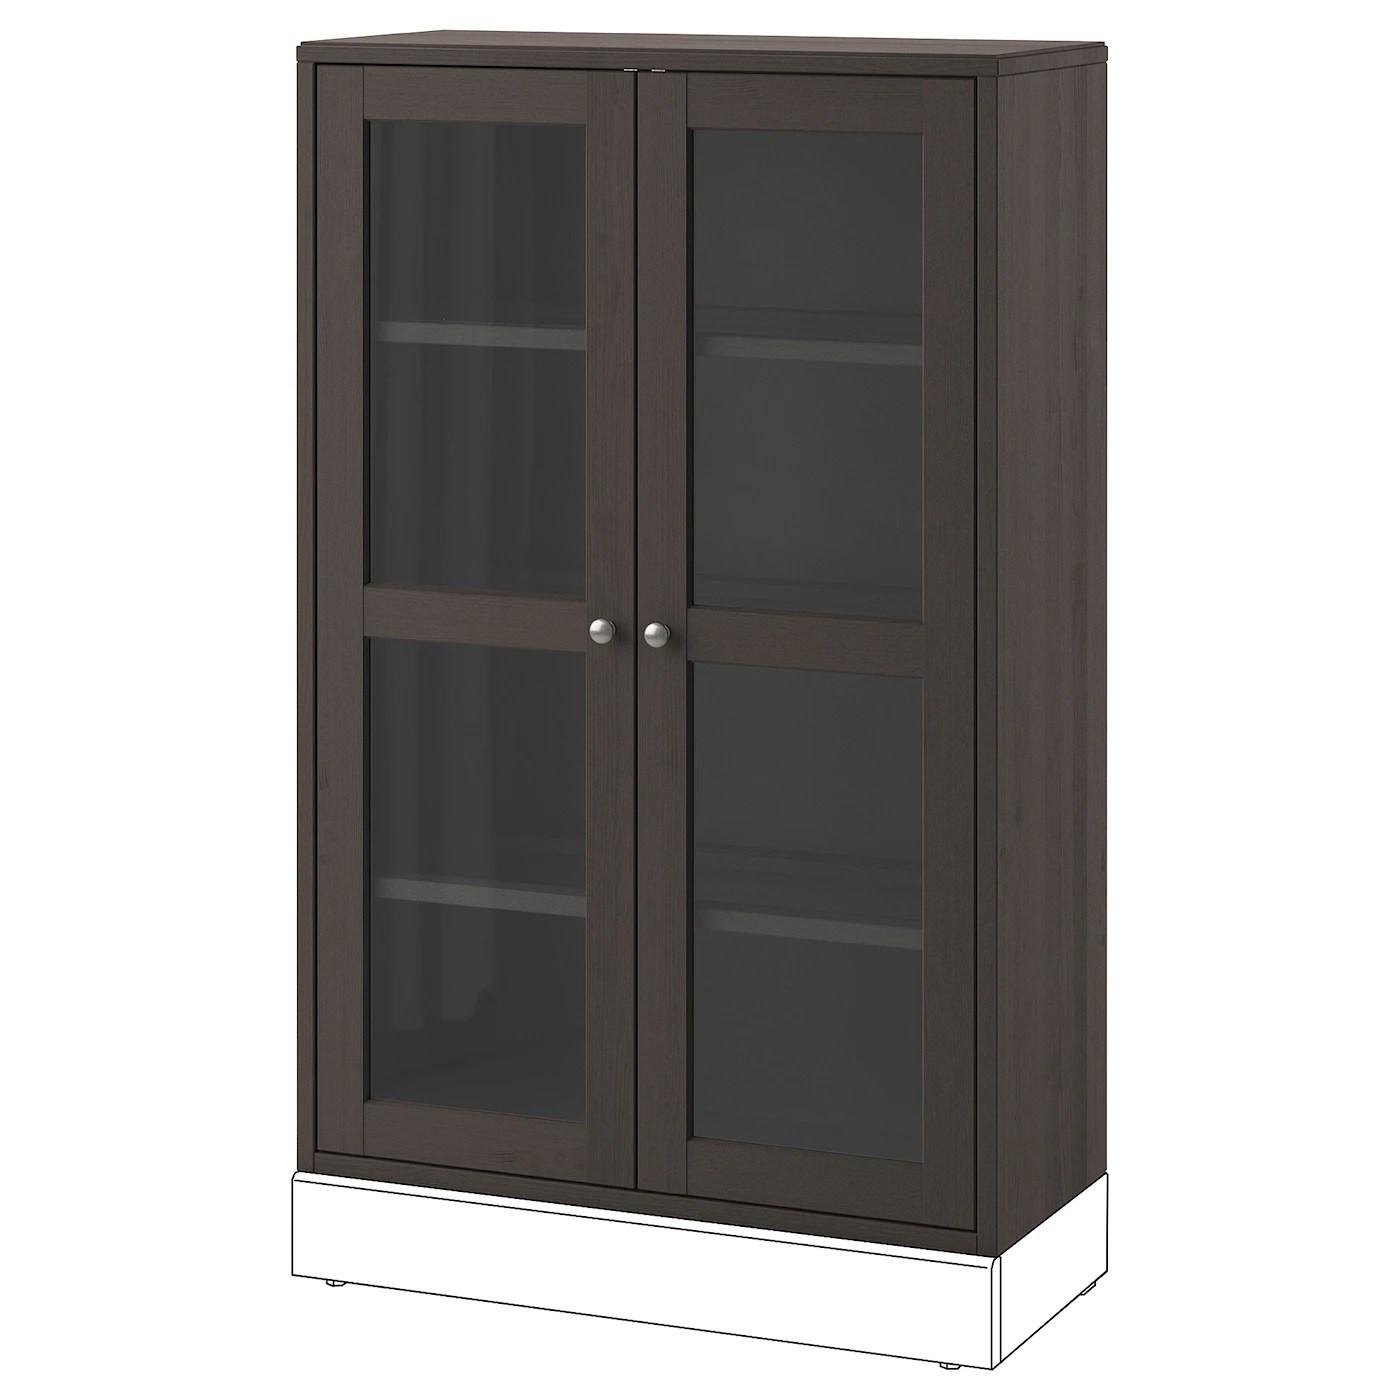 havsta vitrine dunkelbraun 81x35x123 cm